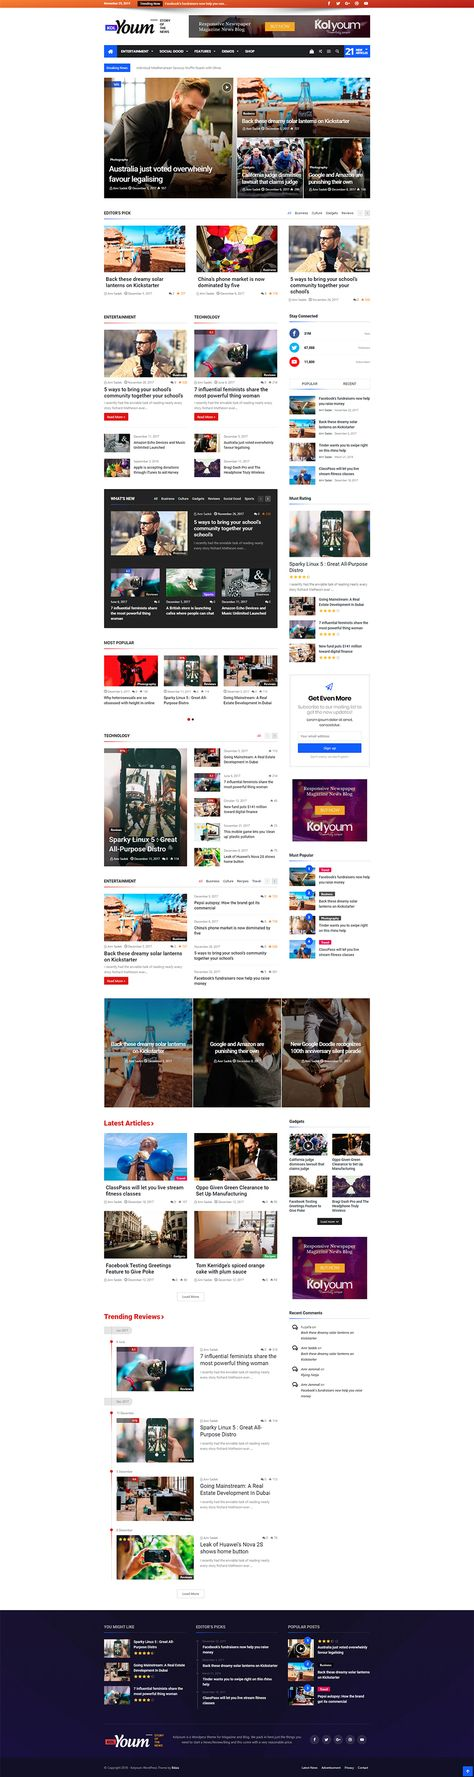 Kolyoum – Newspaper WordPress Theme